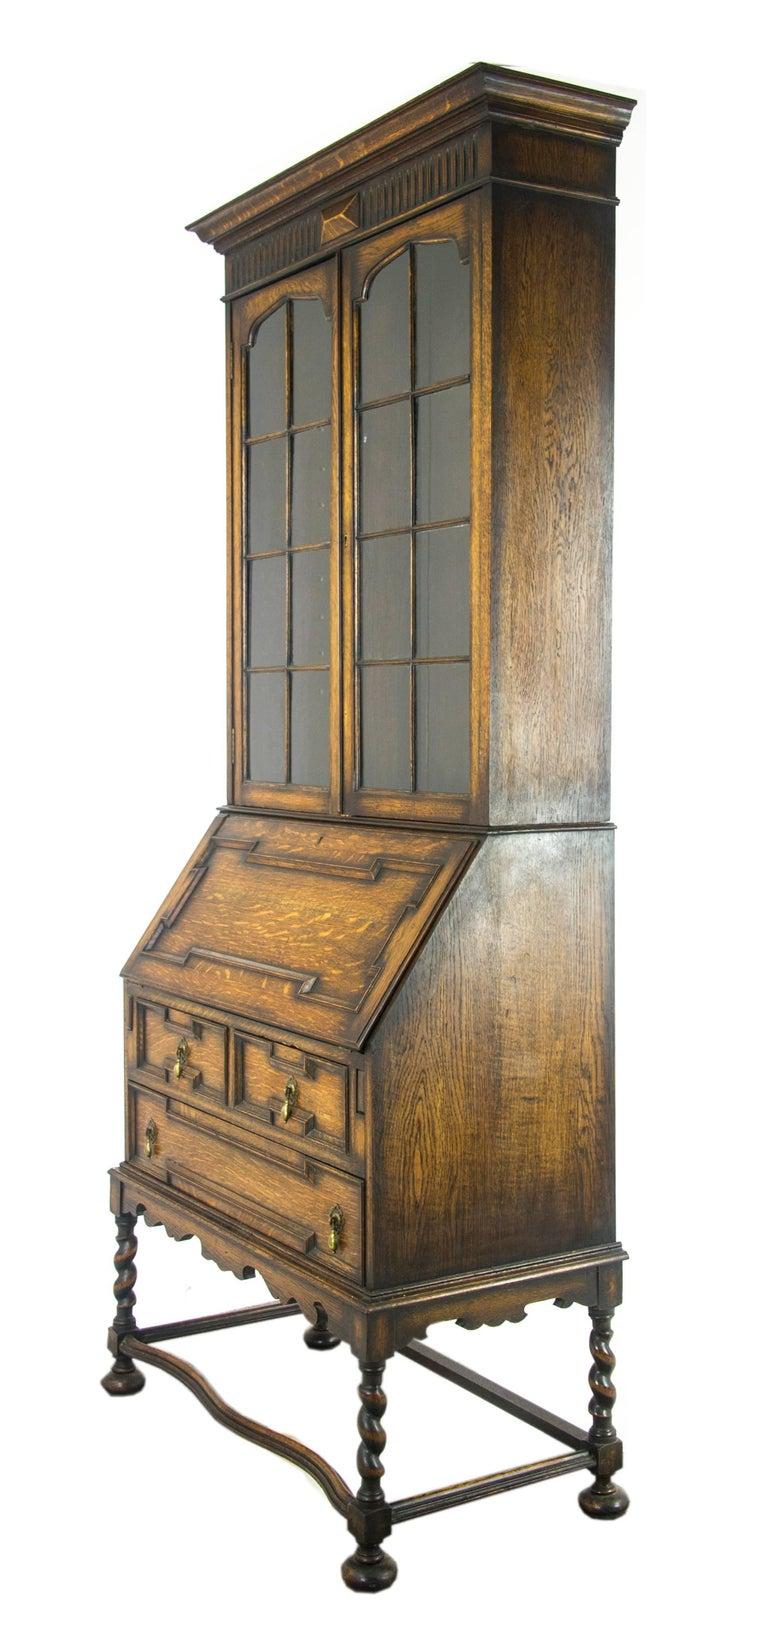 Hand-Crafted Antique Secretary Desk, Victorian Oak Desk, Fall Front Desk,  Scotland - Antique Secretary Desk, Victorian Oak Desk, Fall Front Desk